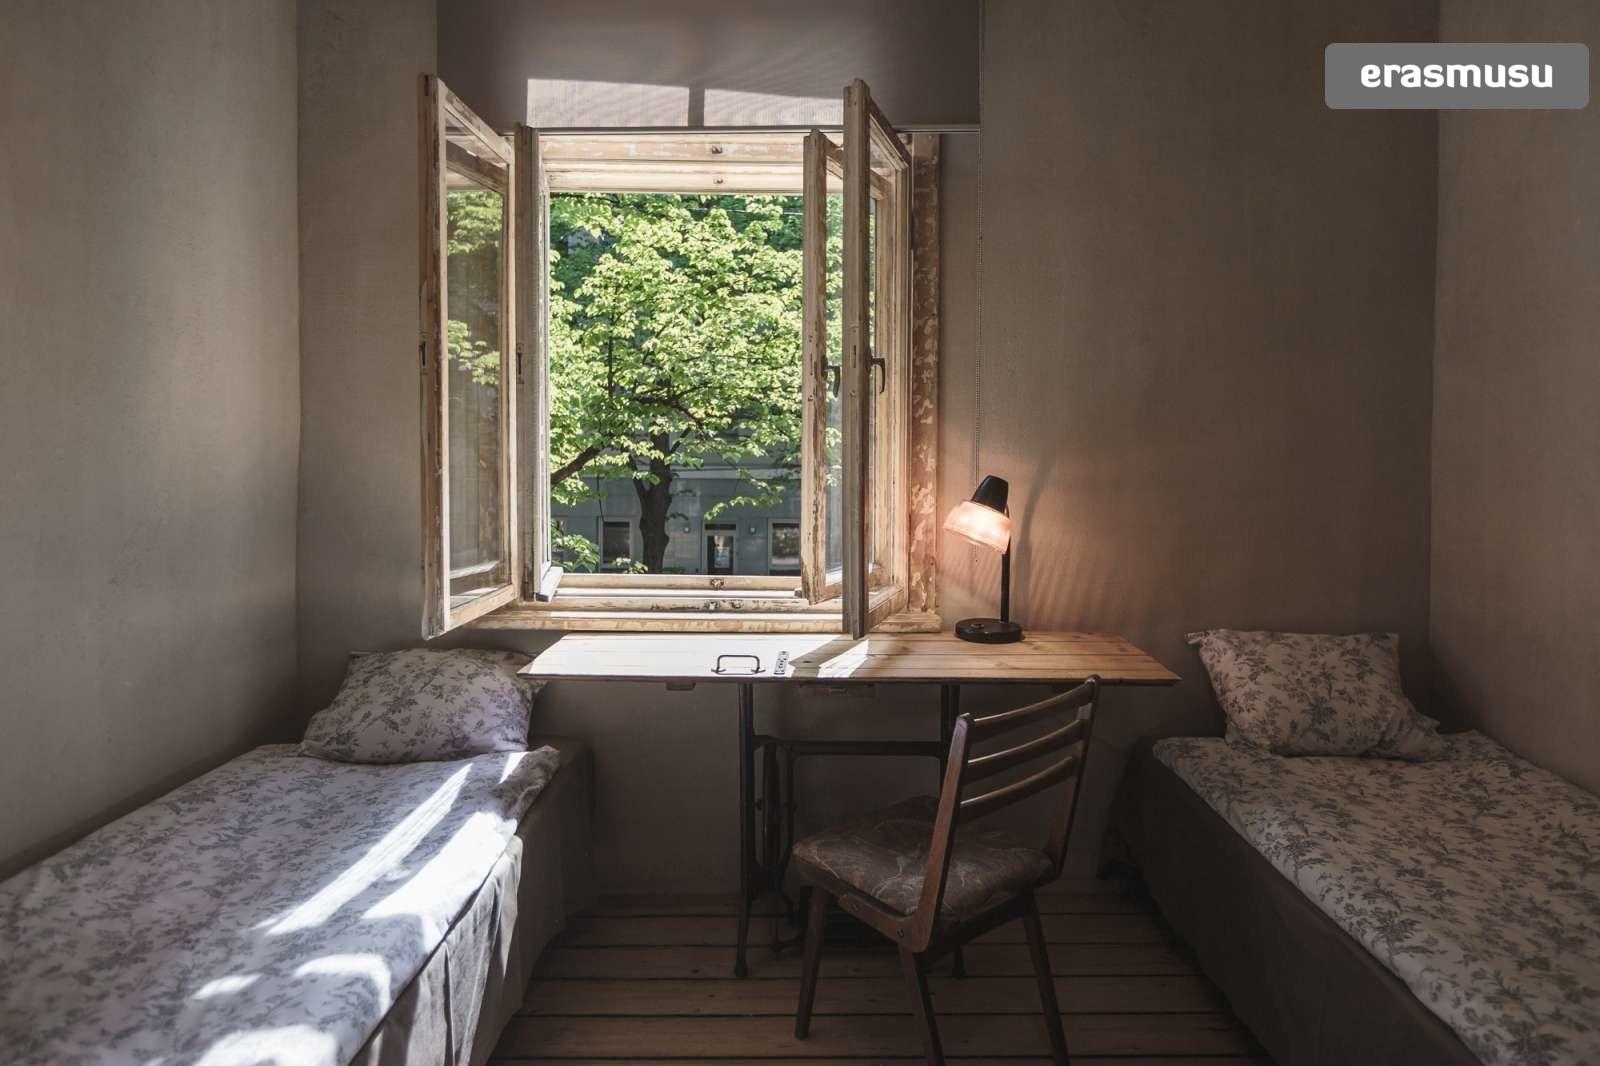 charming-studio-apartment-rent-agenskalns-pet-friendly-302085354